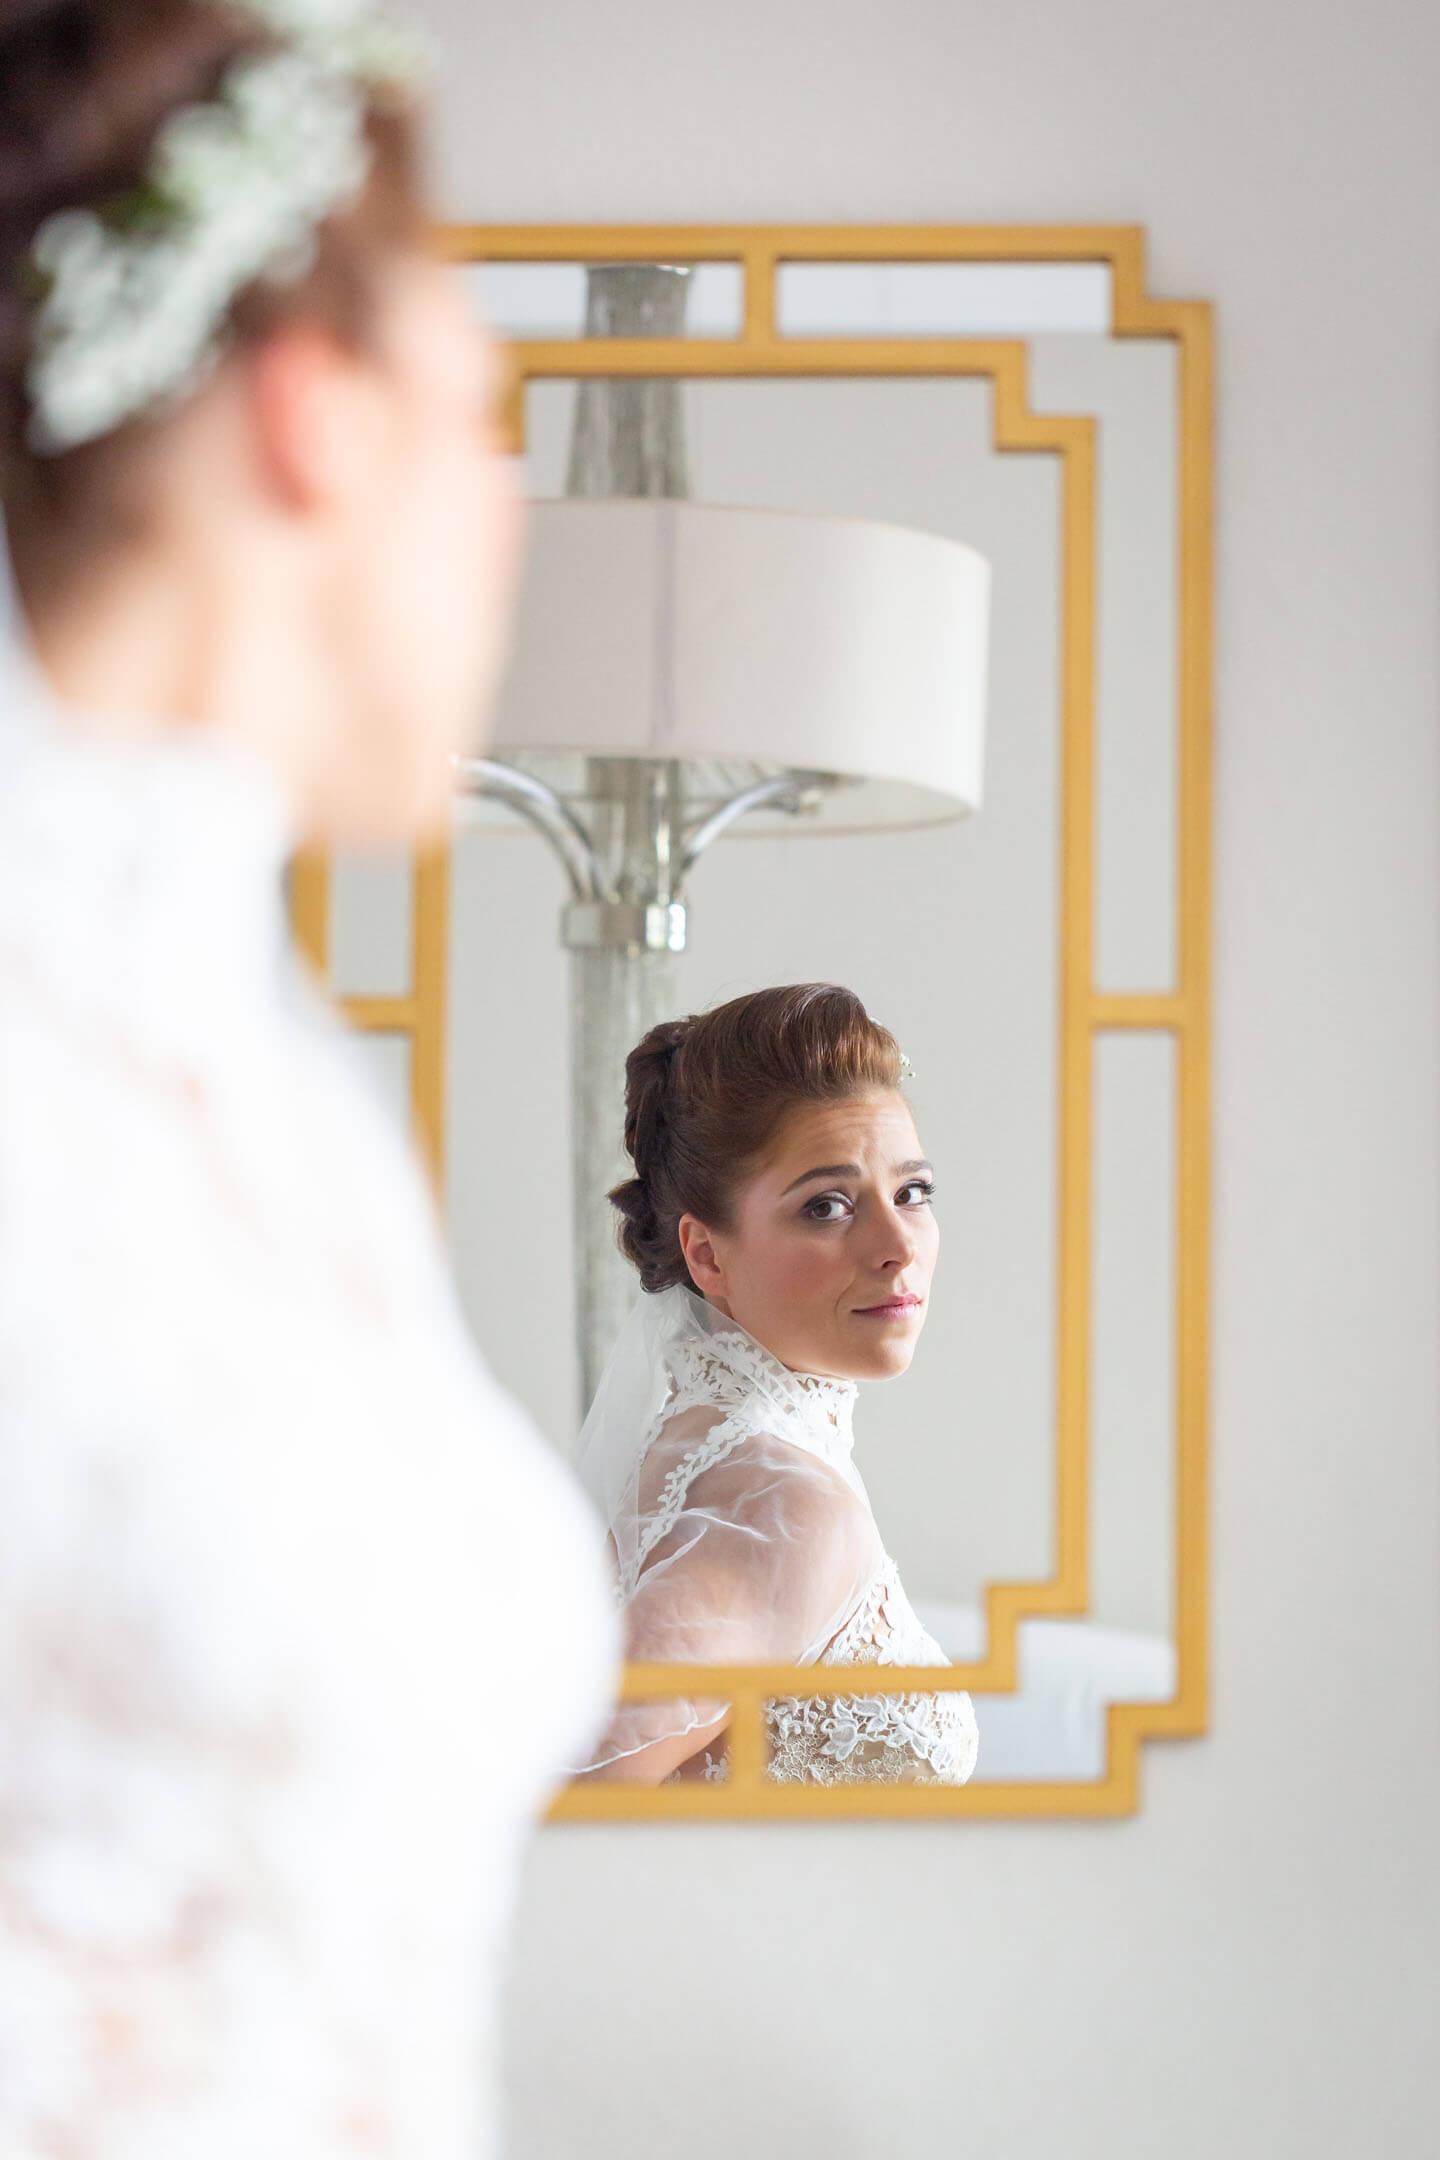 Braut blickt in den Spiegel. Foto: Florian Läufer